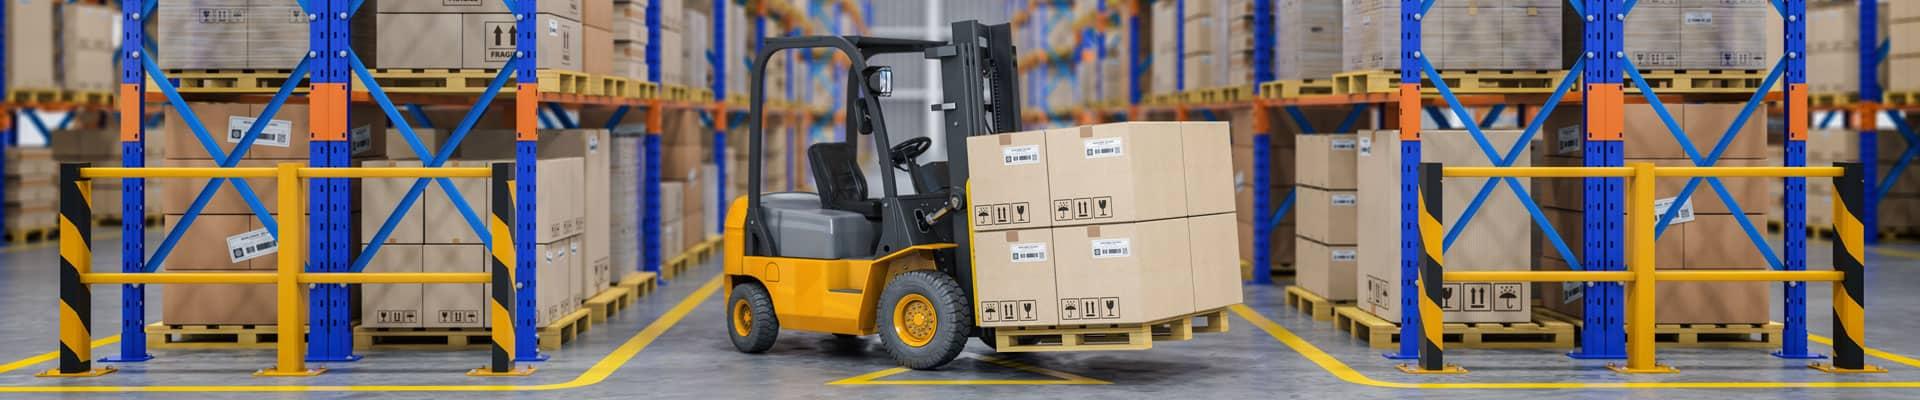 services warehouse forklift header